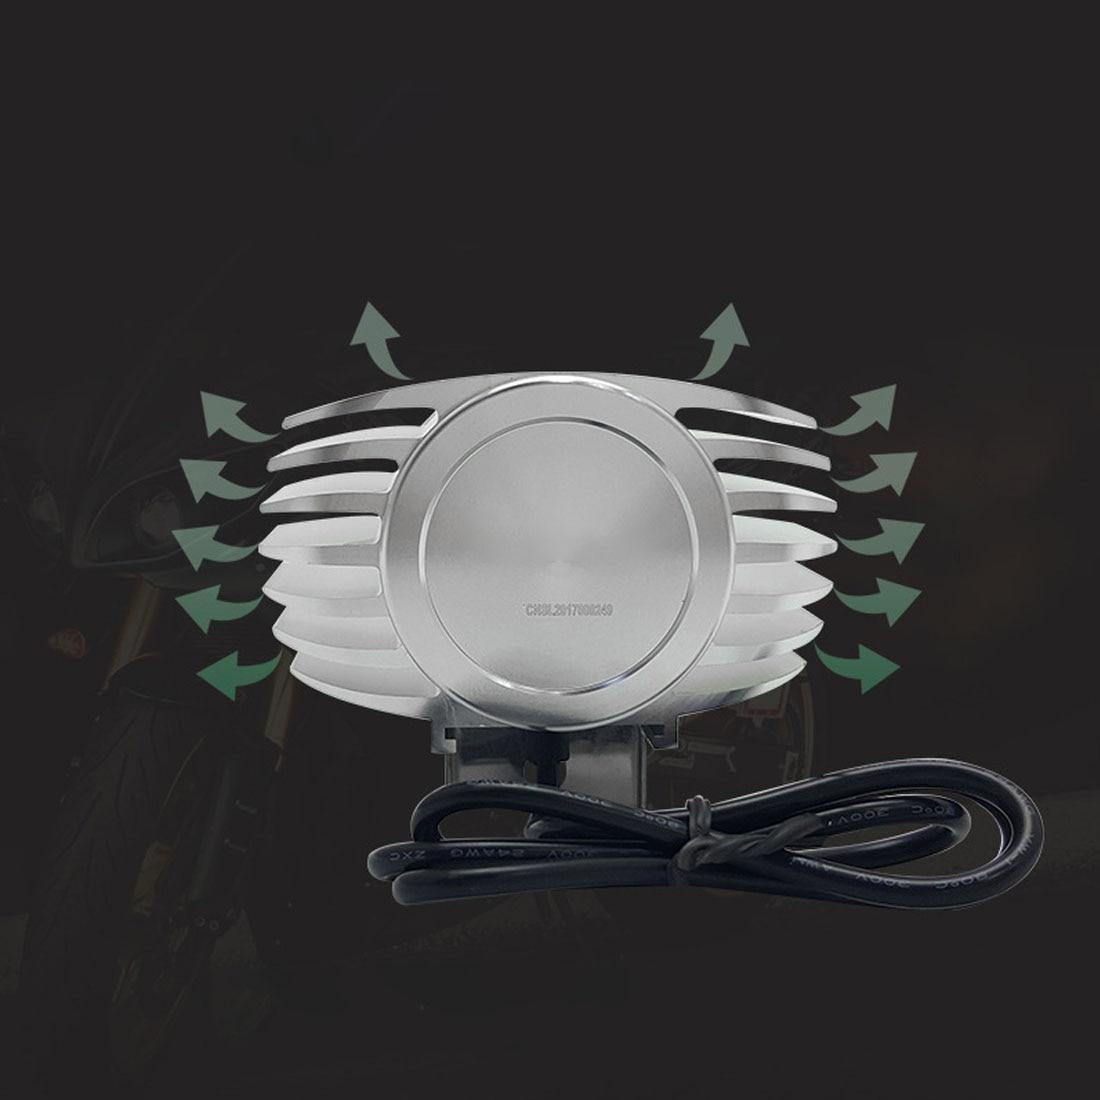 Tonewan LED Car External Headlight 8W 10W 15W 6000K White Motorcycle Fog DRL Headlamp Spotlight Hunting Driving Spot Light exled 12w 72lm 4 led white light headlamp spotlight for motorcycle electric car black